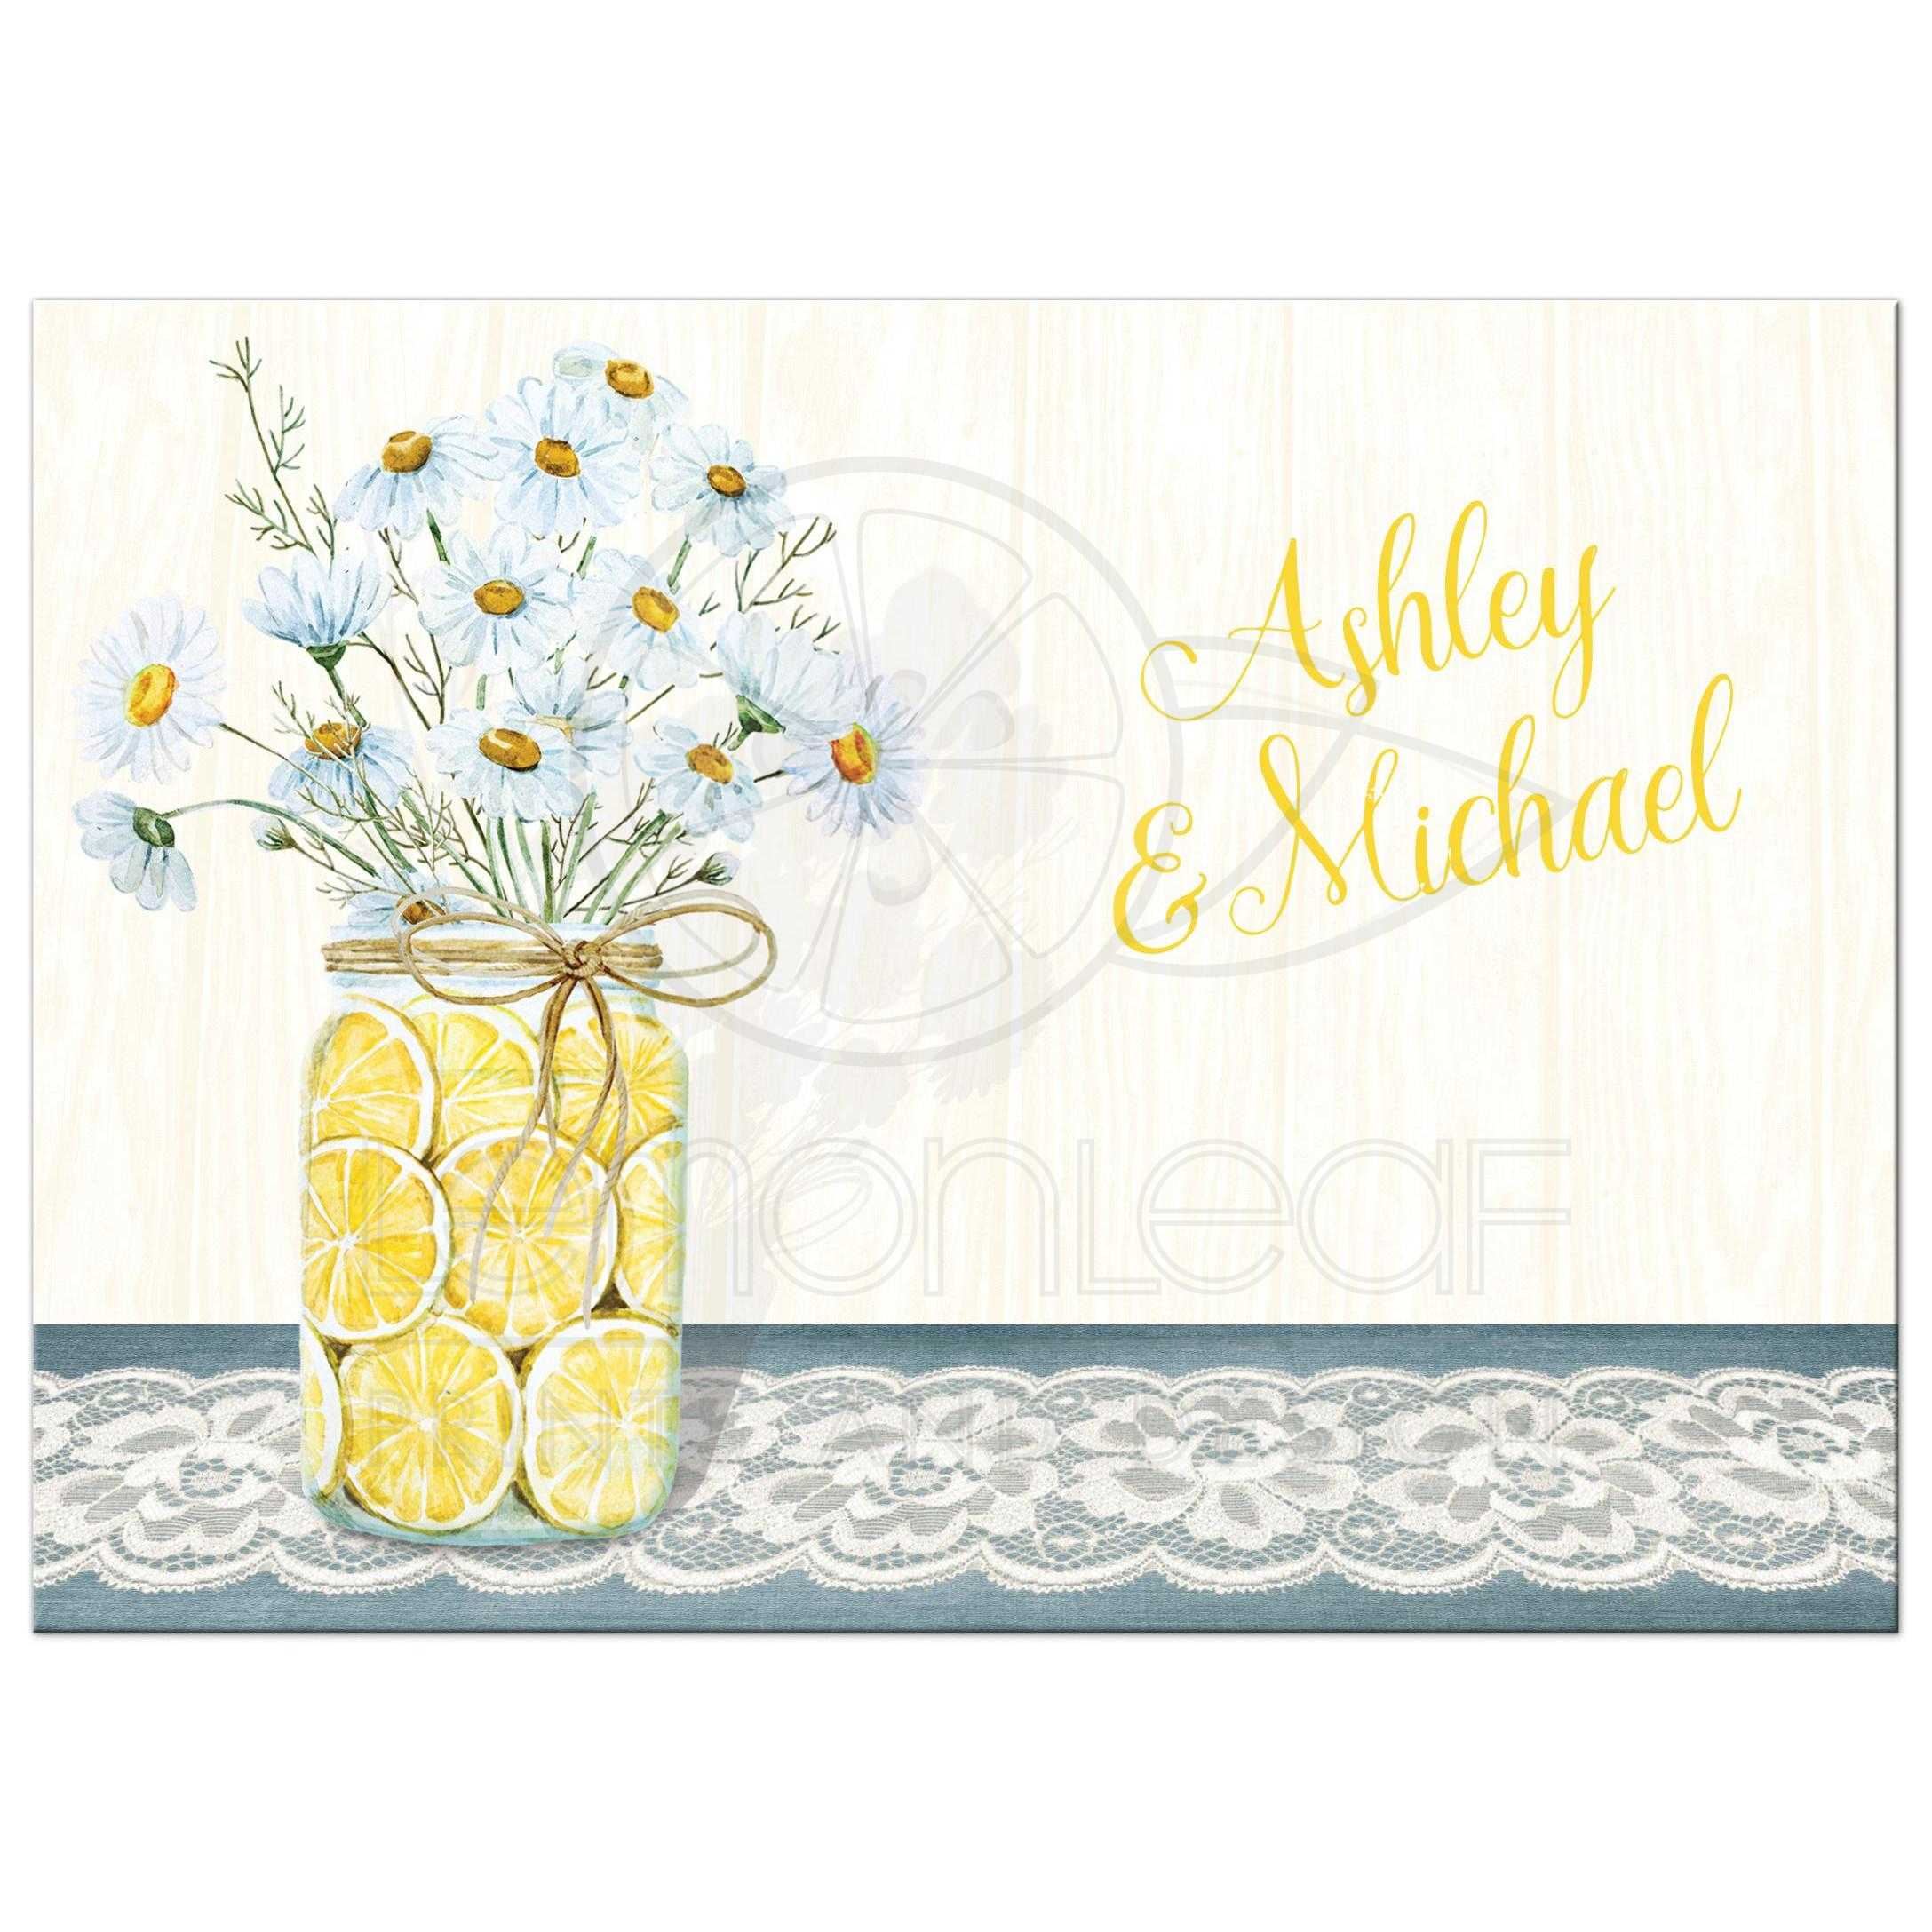 shabby chic wedding invitation daisies lace denim lemons and rh lemonleafprints com shabby chic yellow wallpaper shabby chic yellow furniture